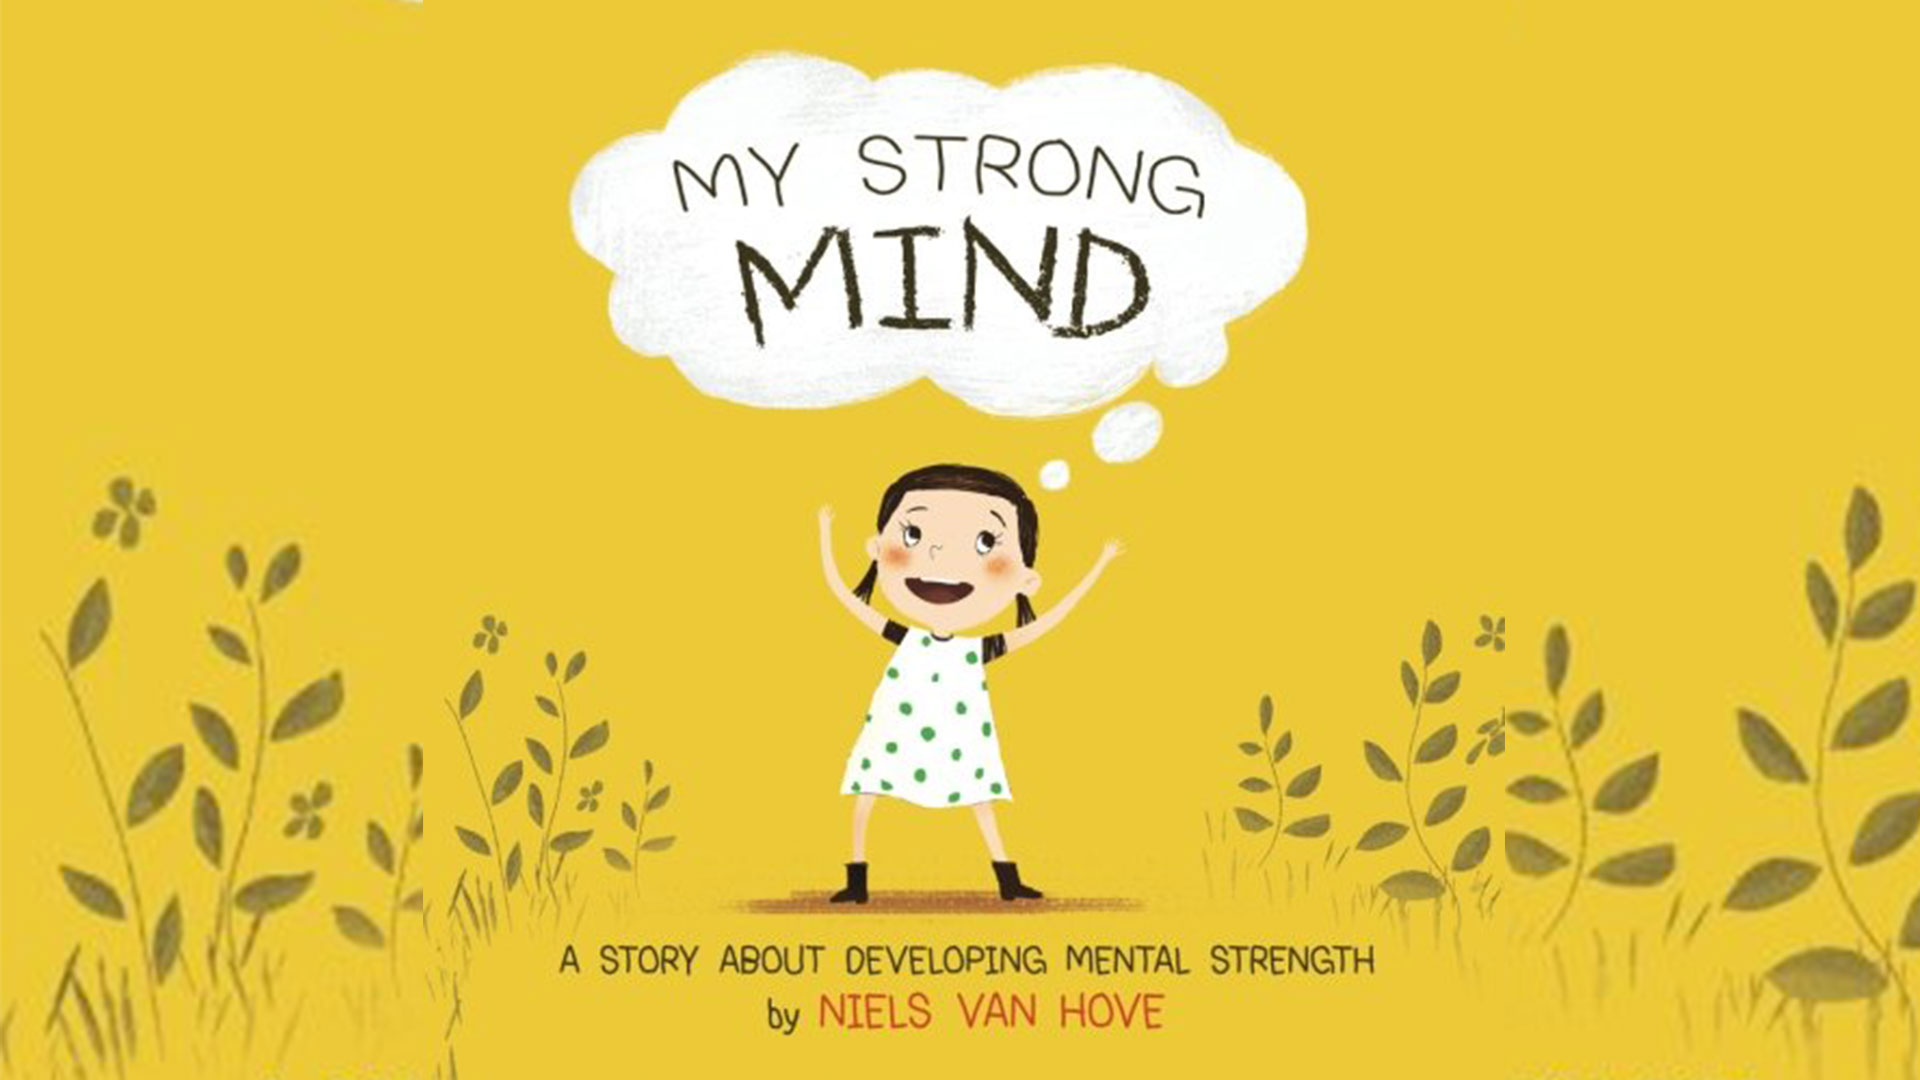 Calm clipart mental strength. Dad writes book to